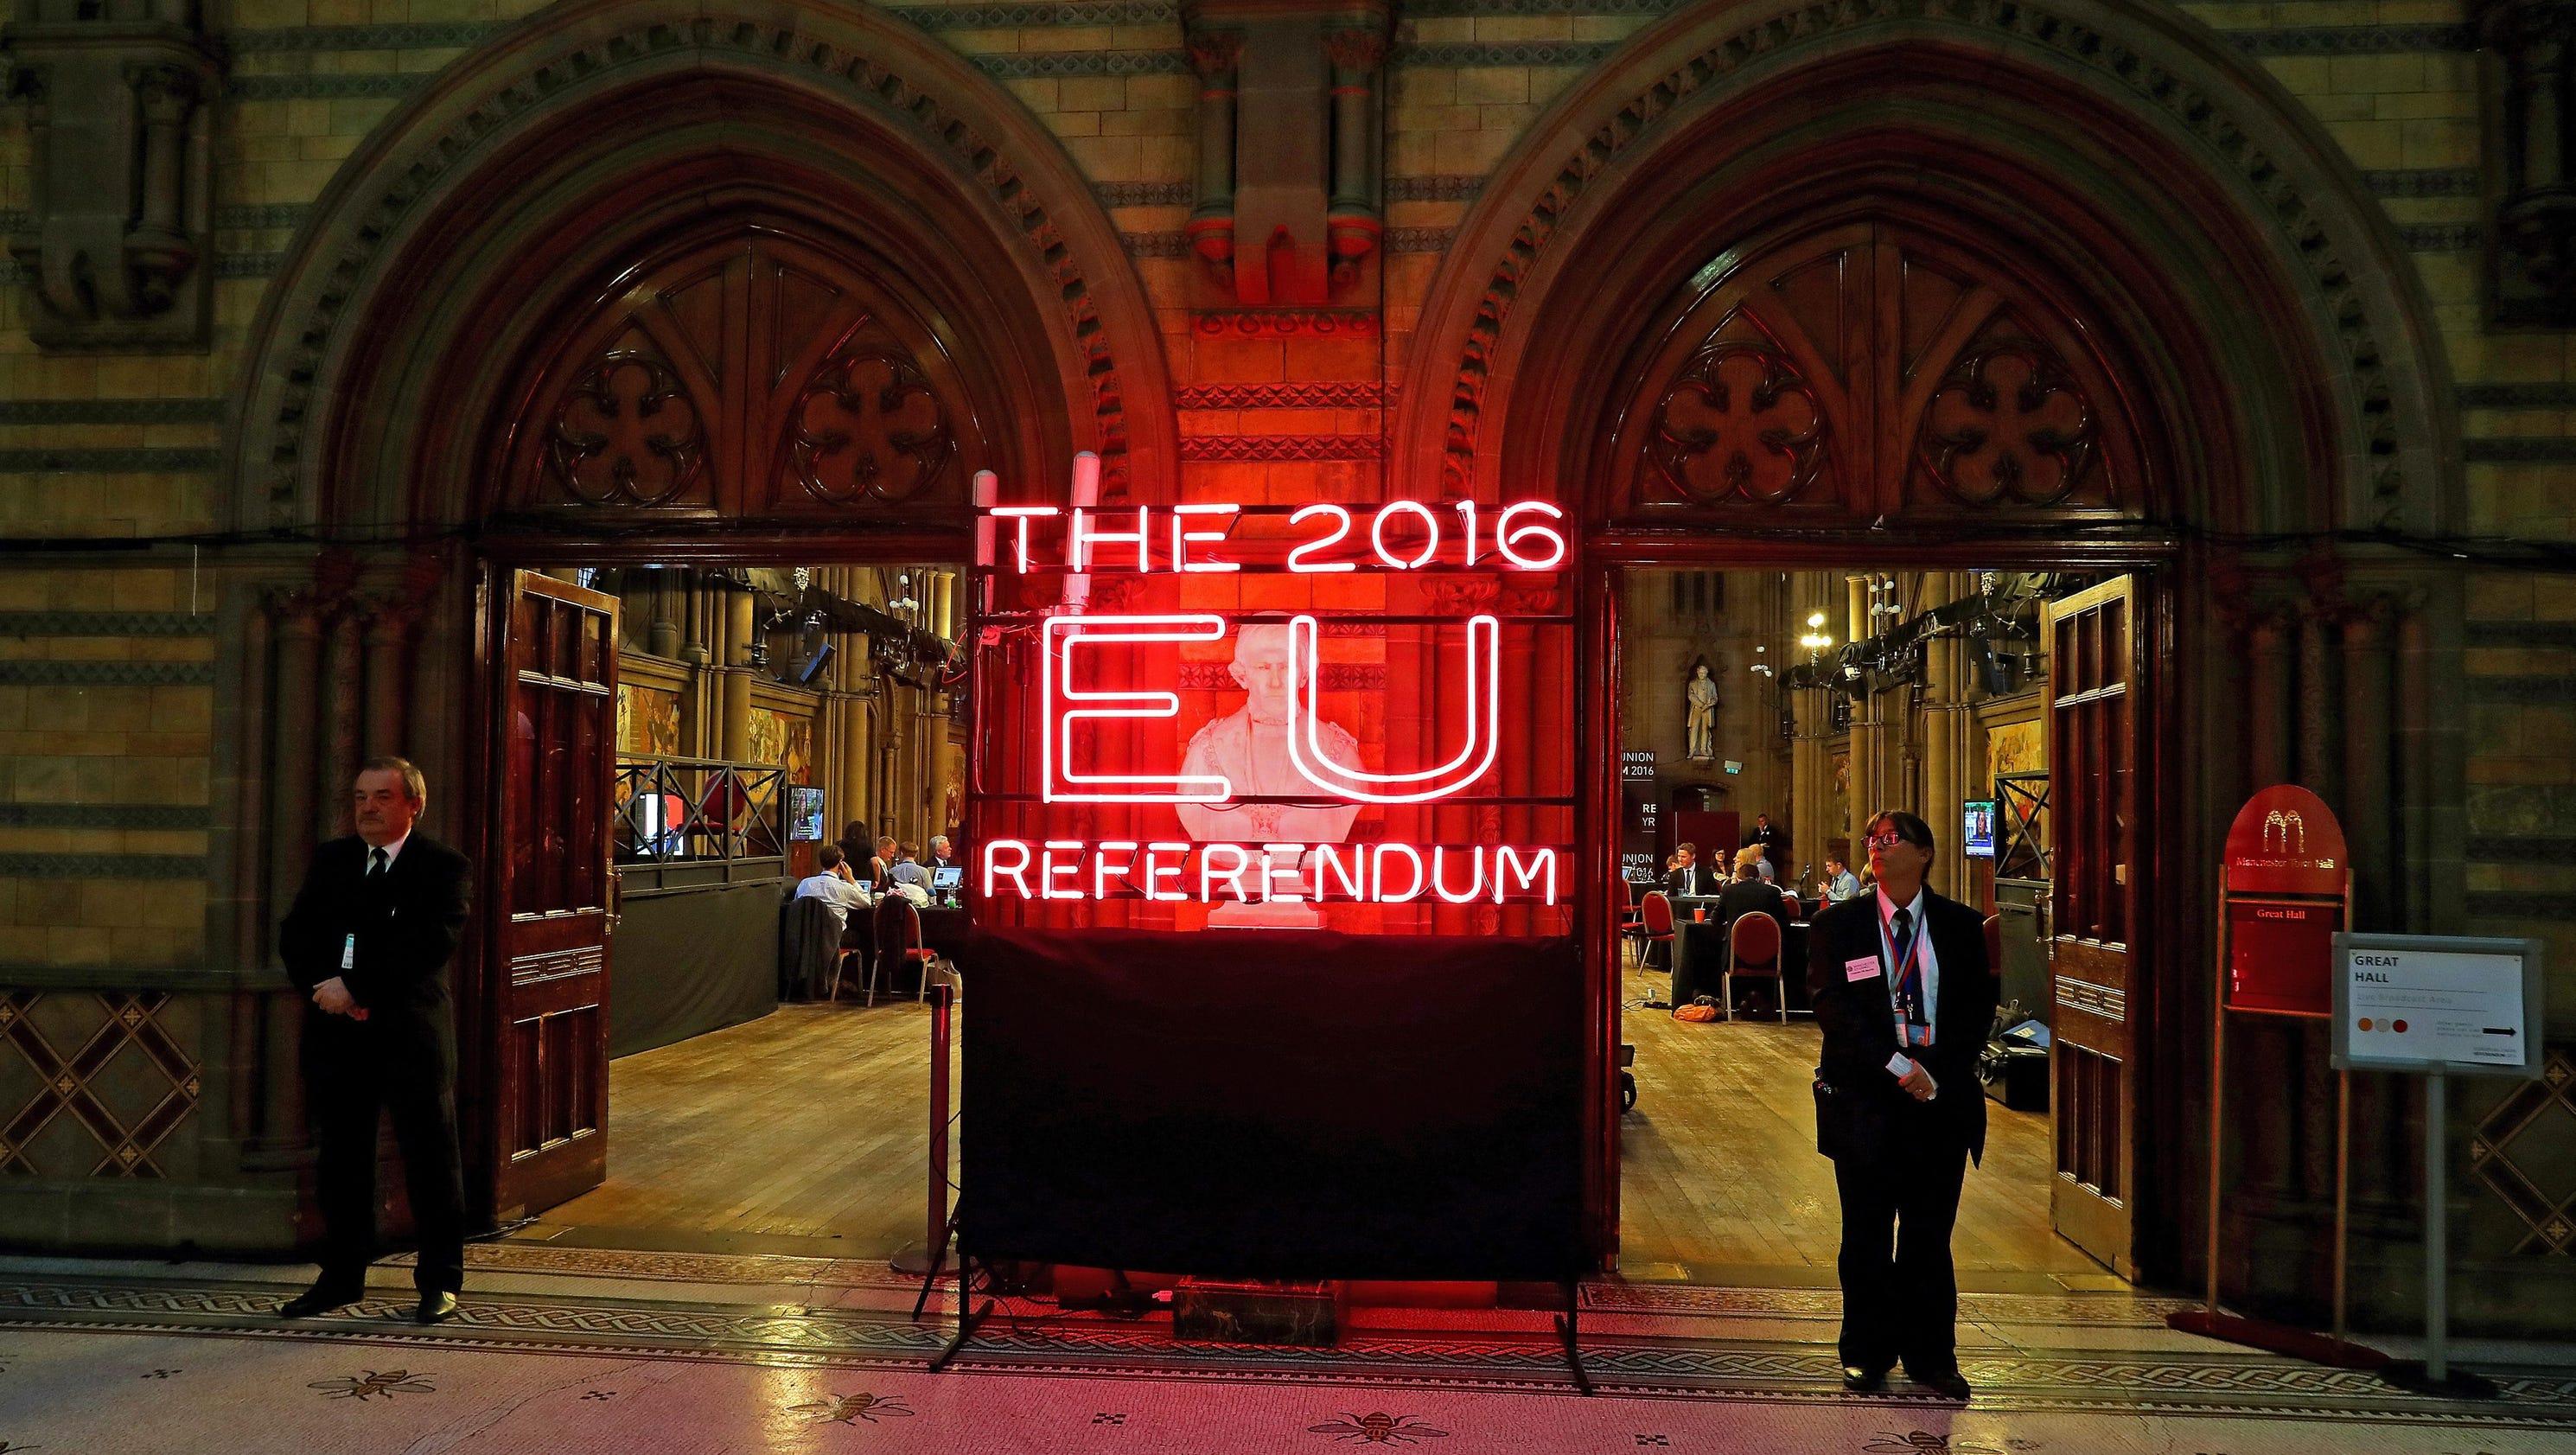 U.K. broadcasters: Britain votes to leave European Union